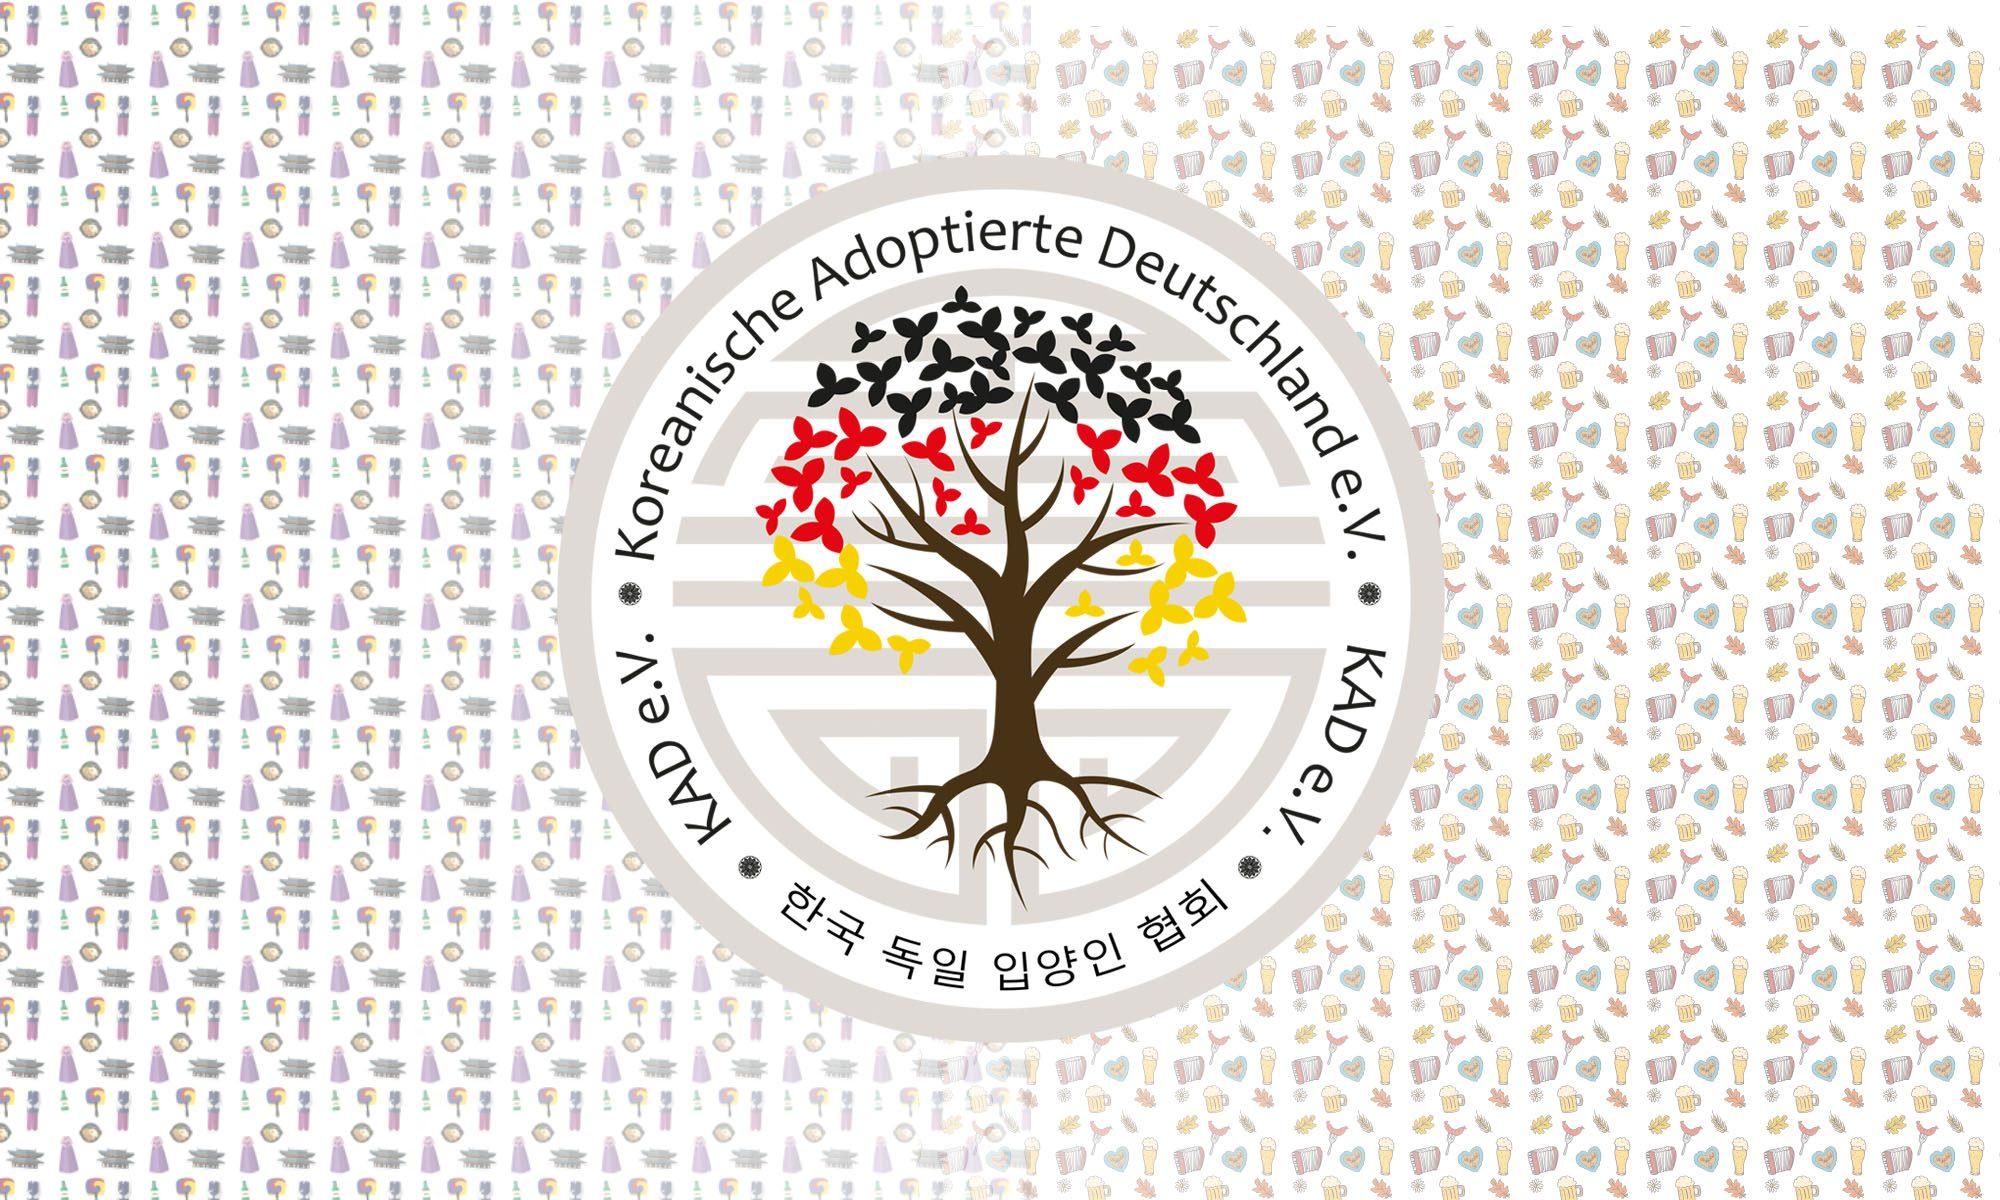 Koreanische Adoptierte Deutschland (KAD) e.V.